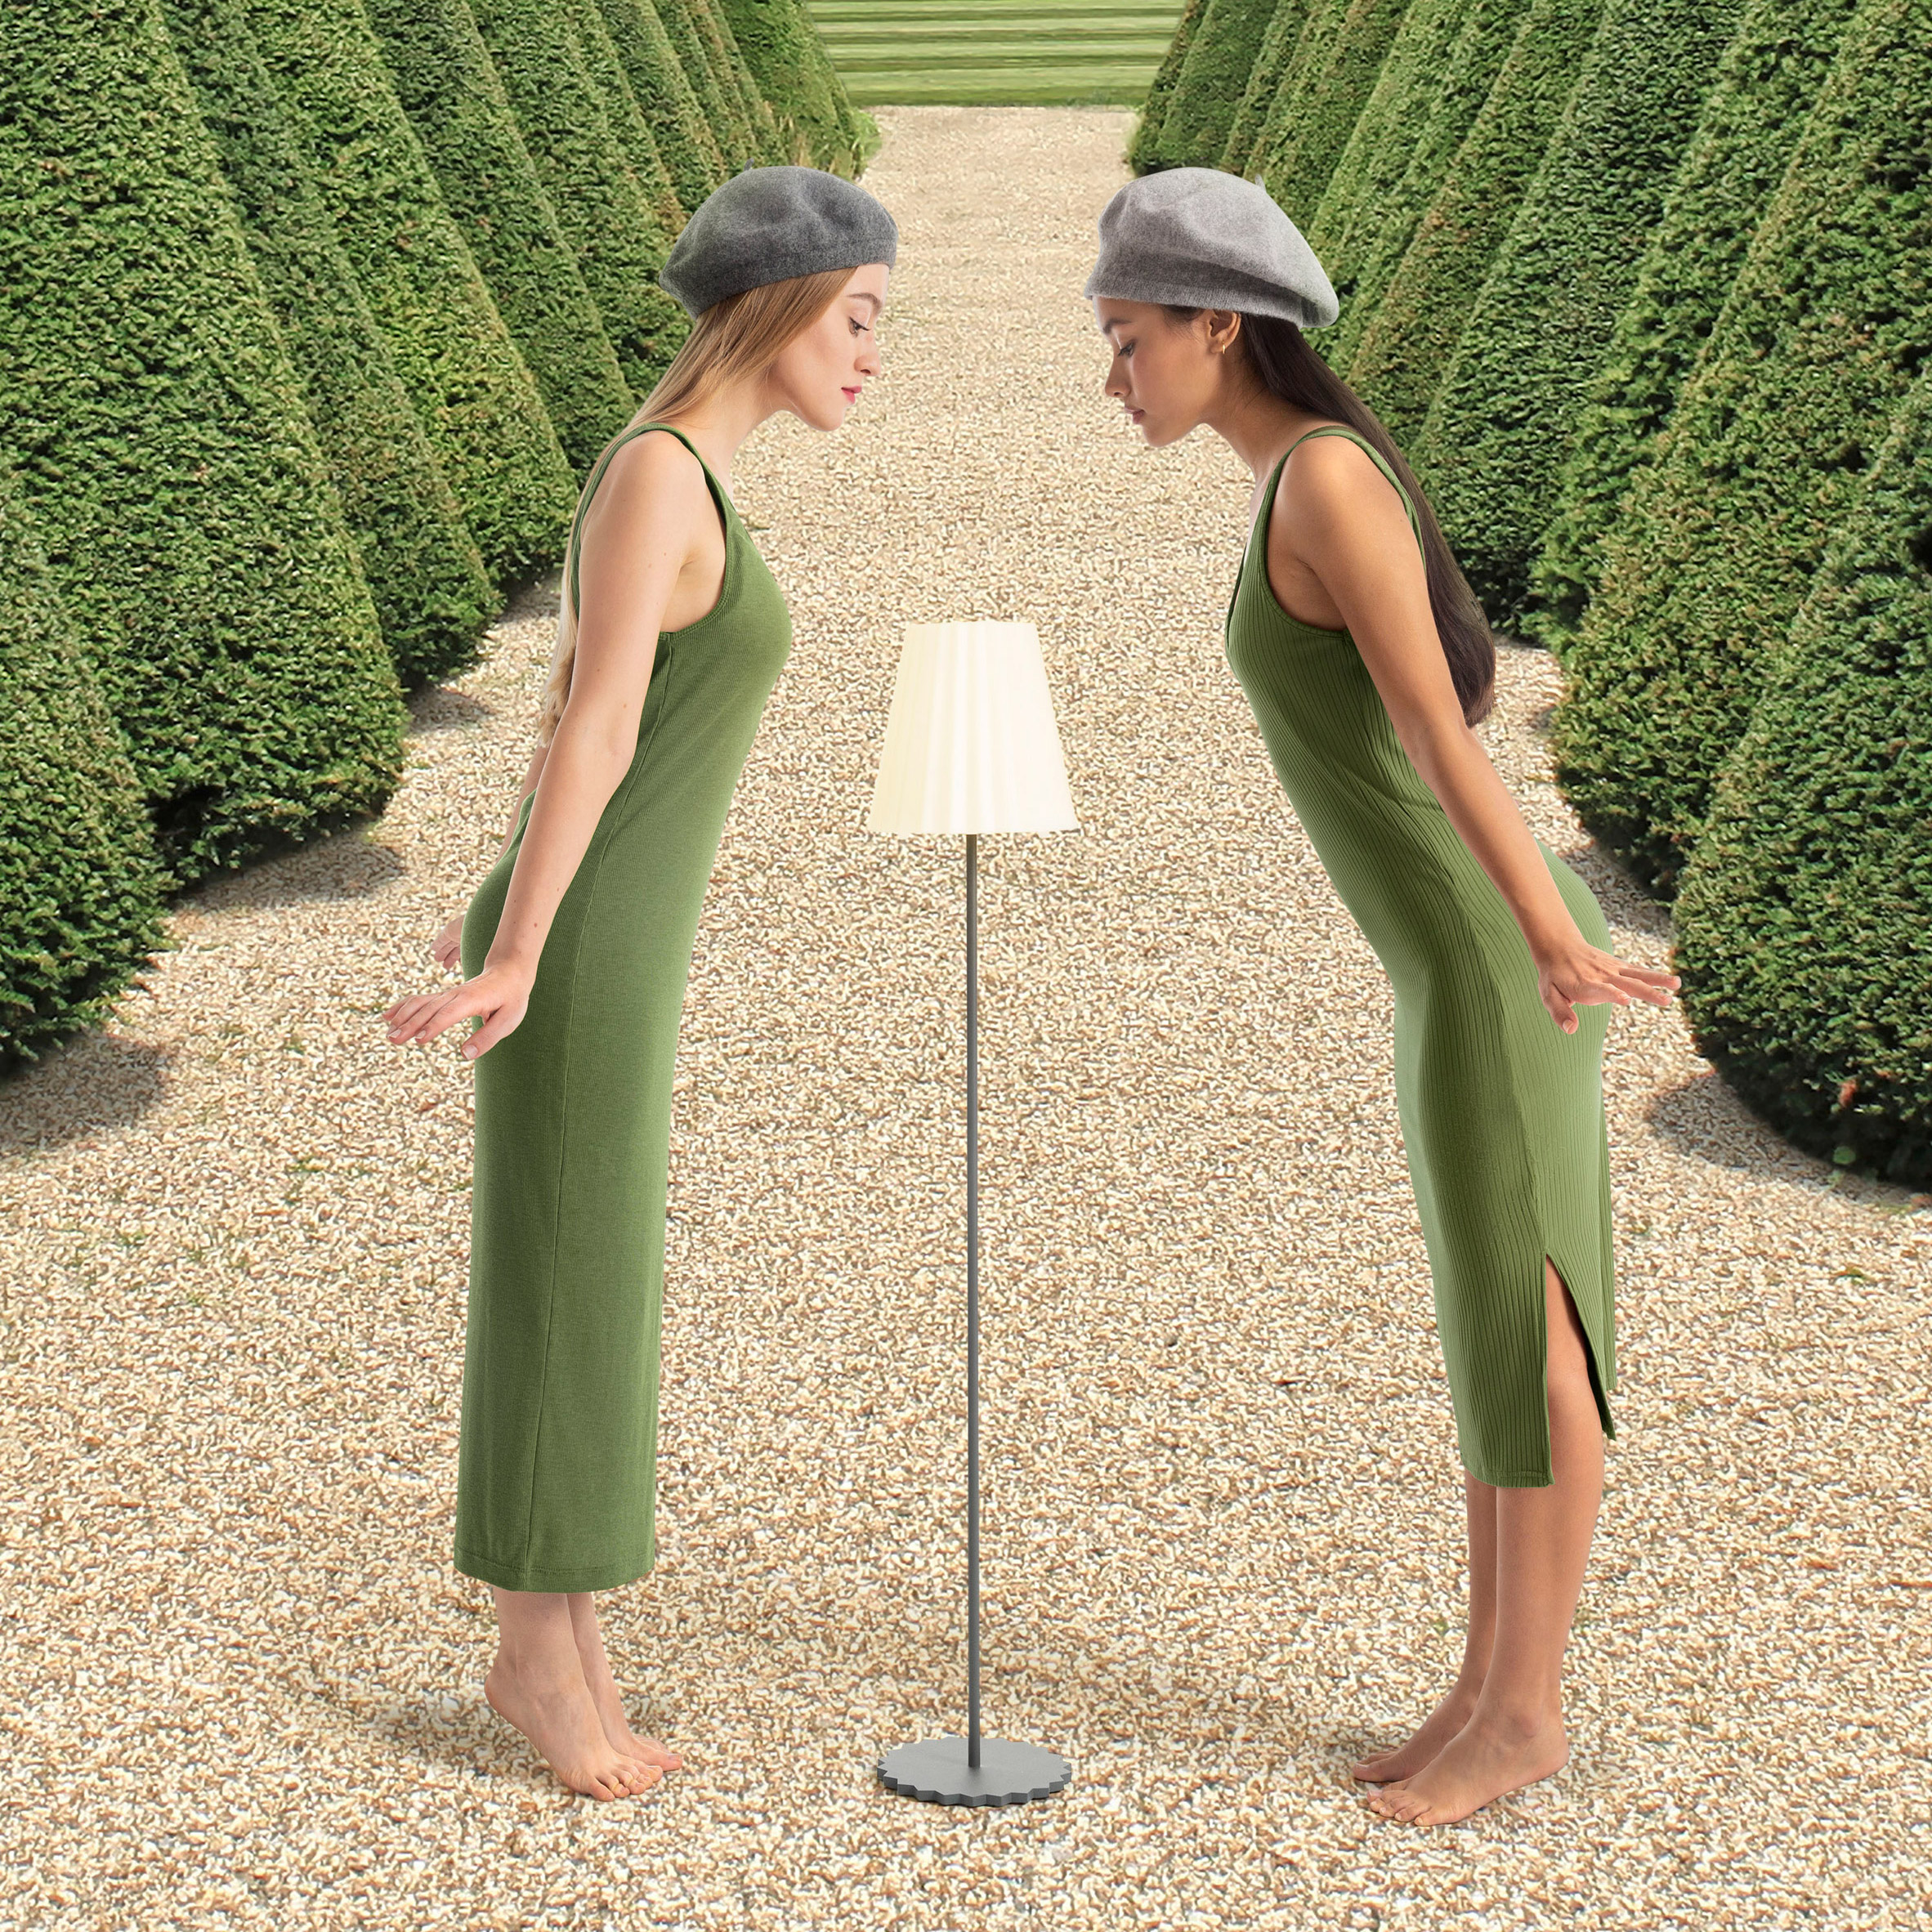 Plisy Up outdoor floor lamp by Alejandra Gandia-Blasco for Diabla